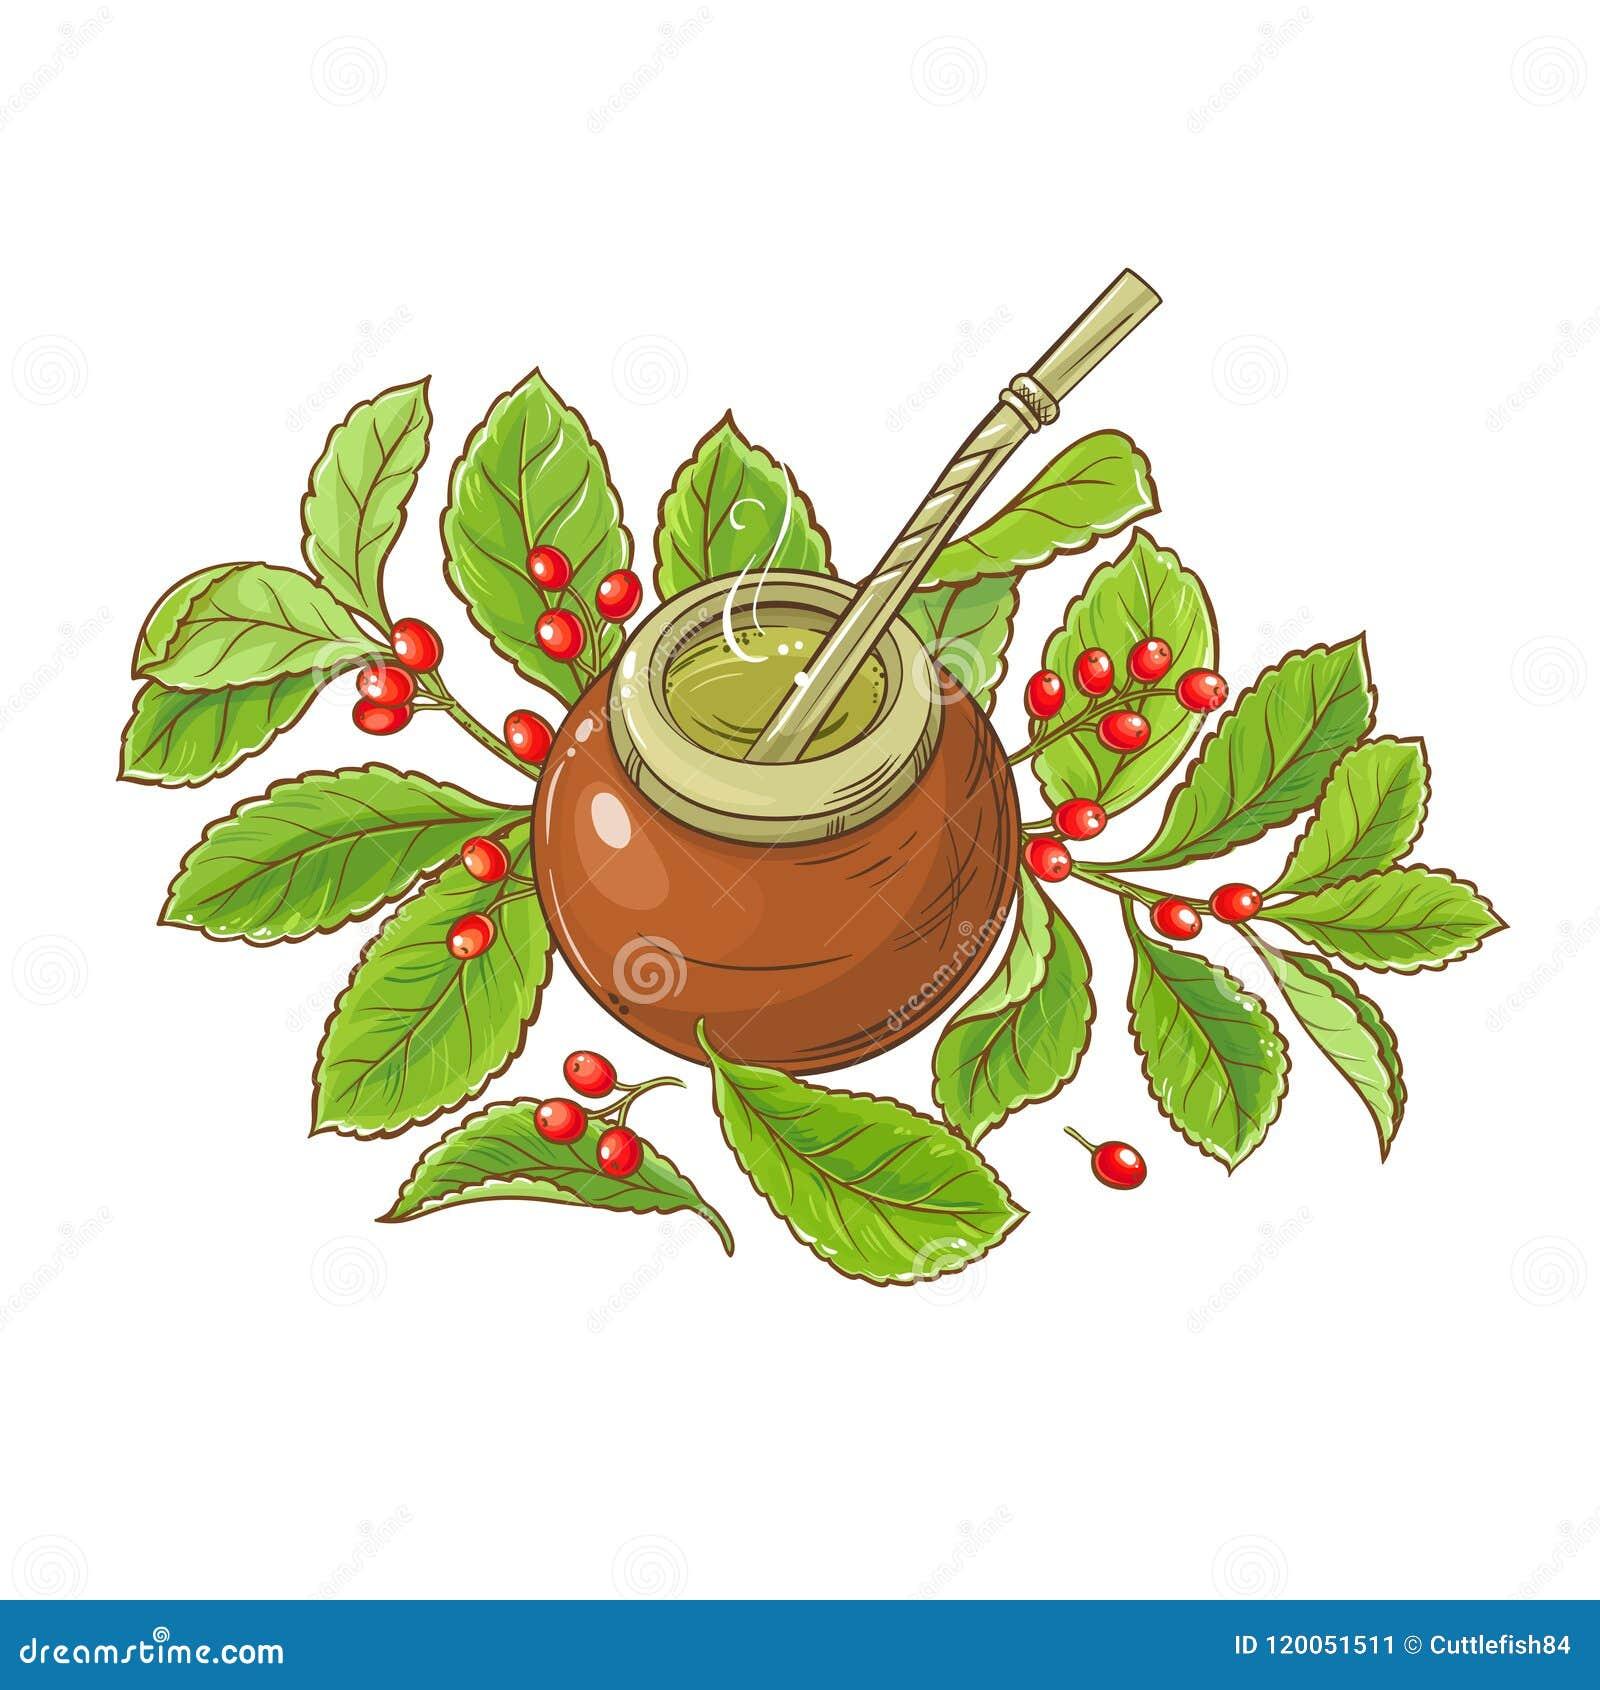 Mate tea vector illustration